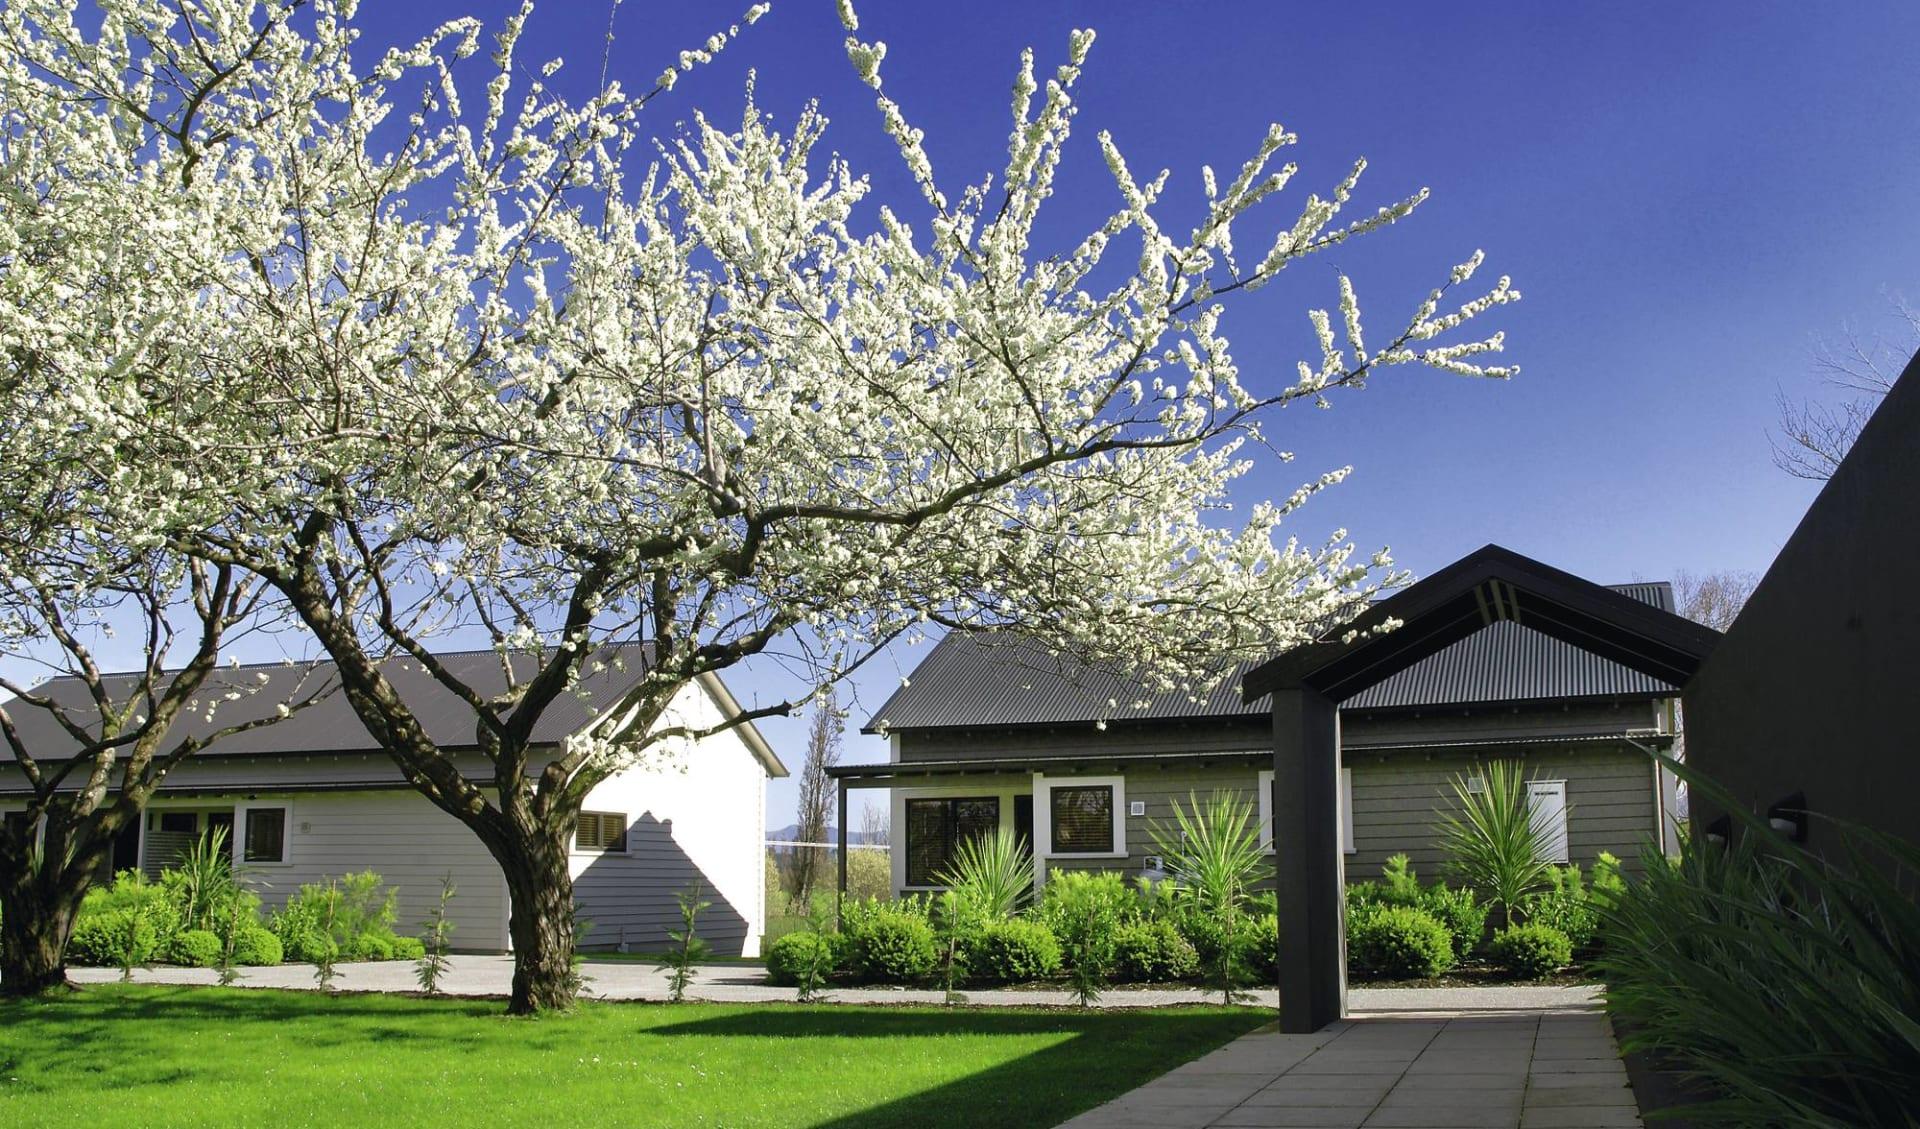 Peppers Parehua Martinborough:  Peppers Parehua Martinborough - Blick auf Lodge mit blühenden Bäumen